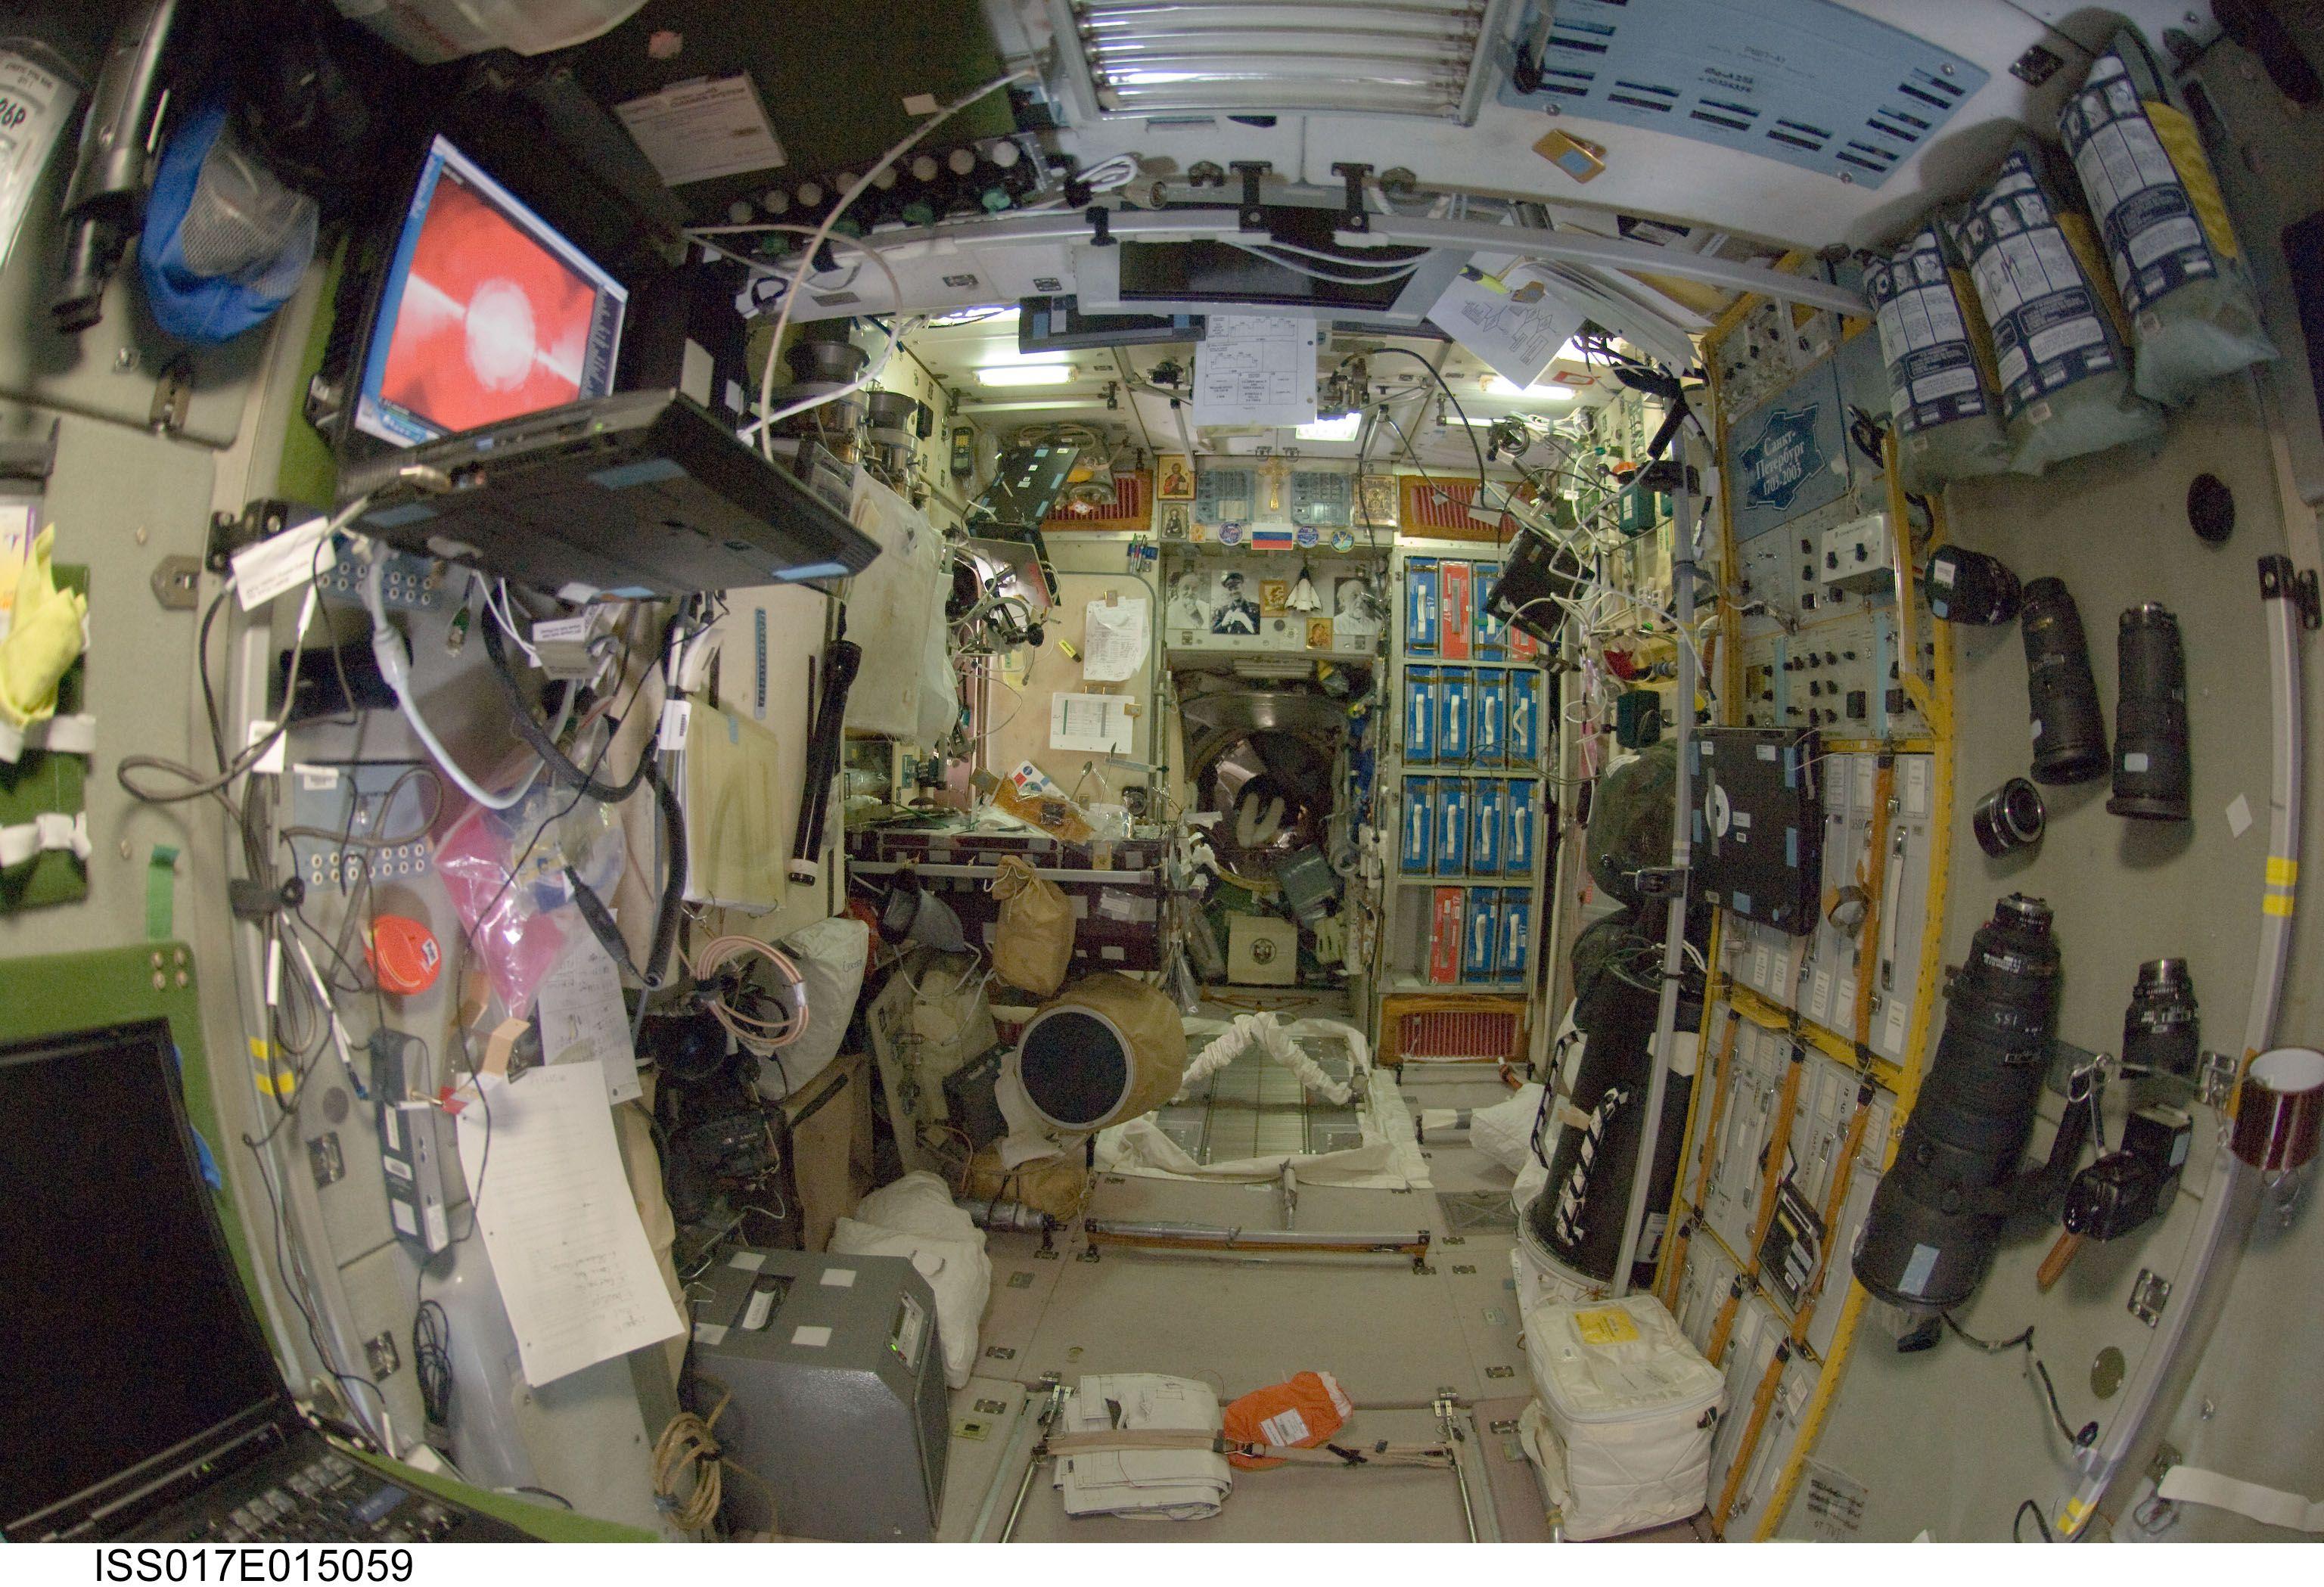 inside space station model - photo #27